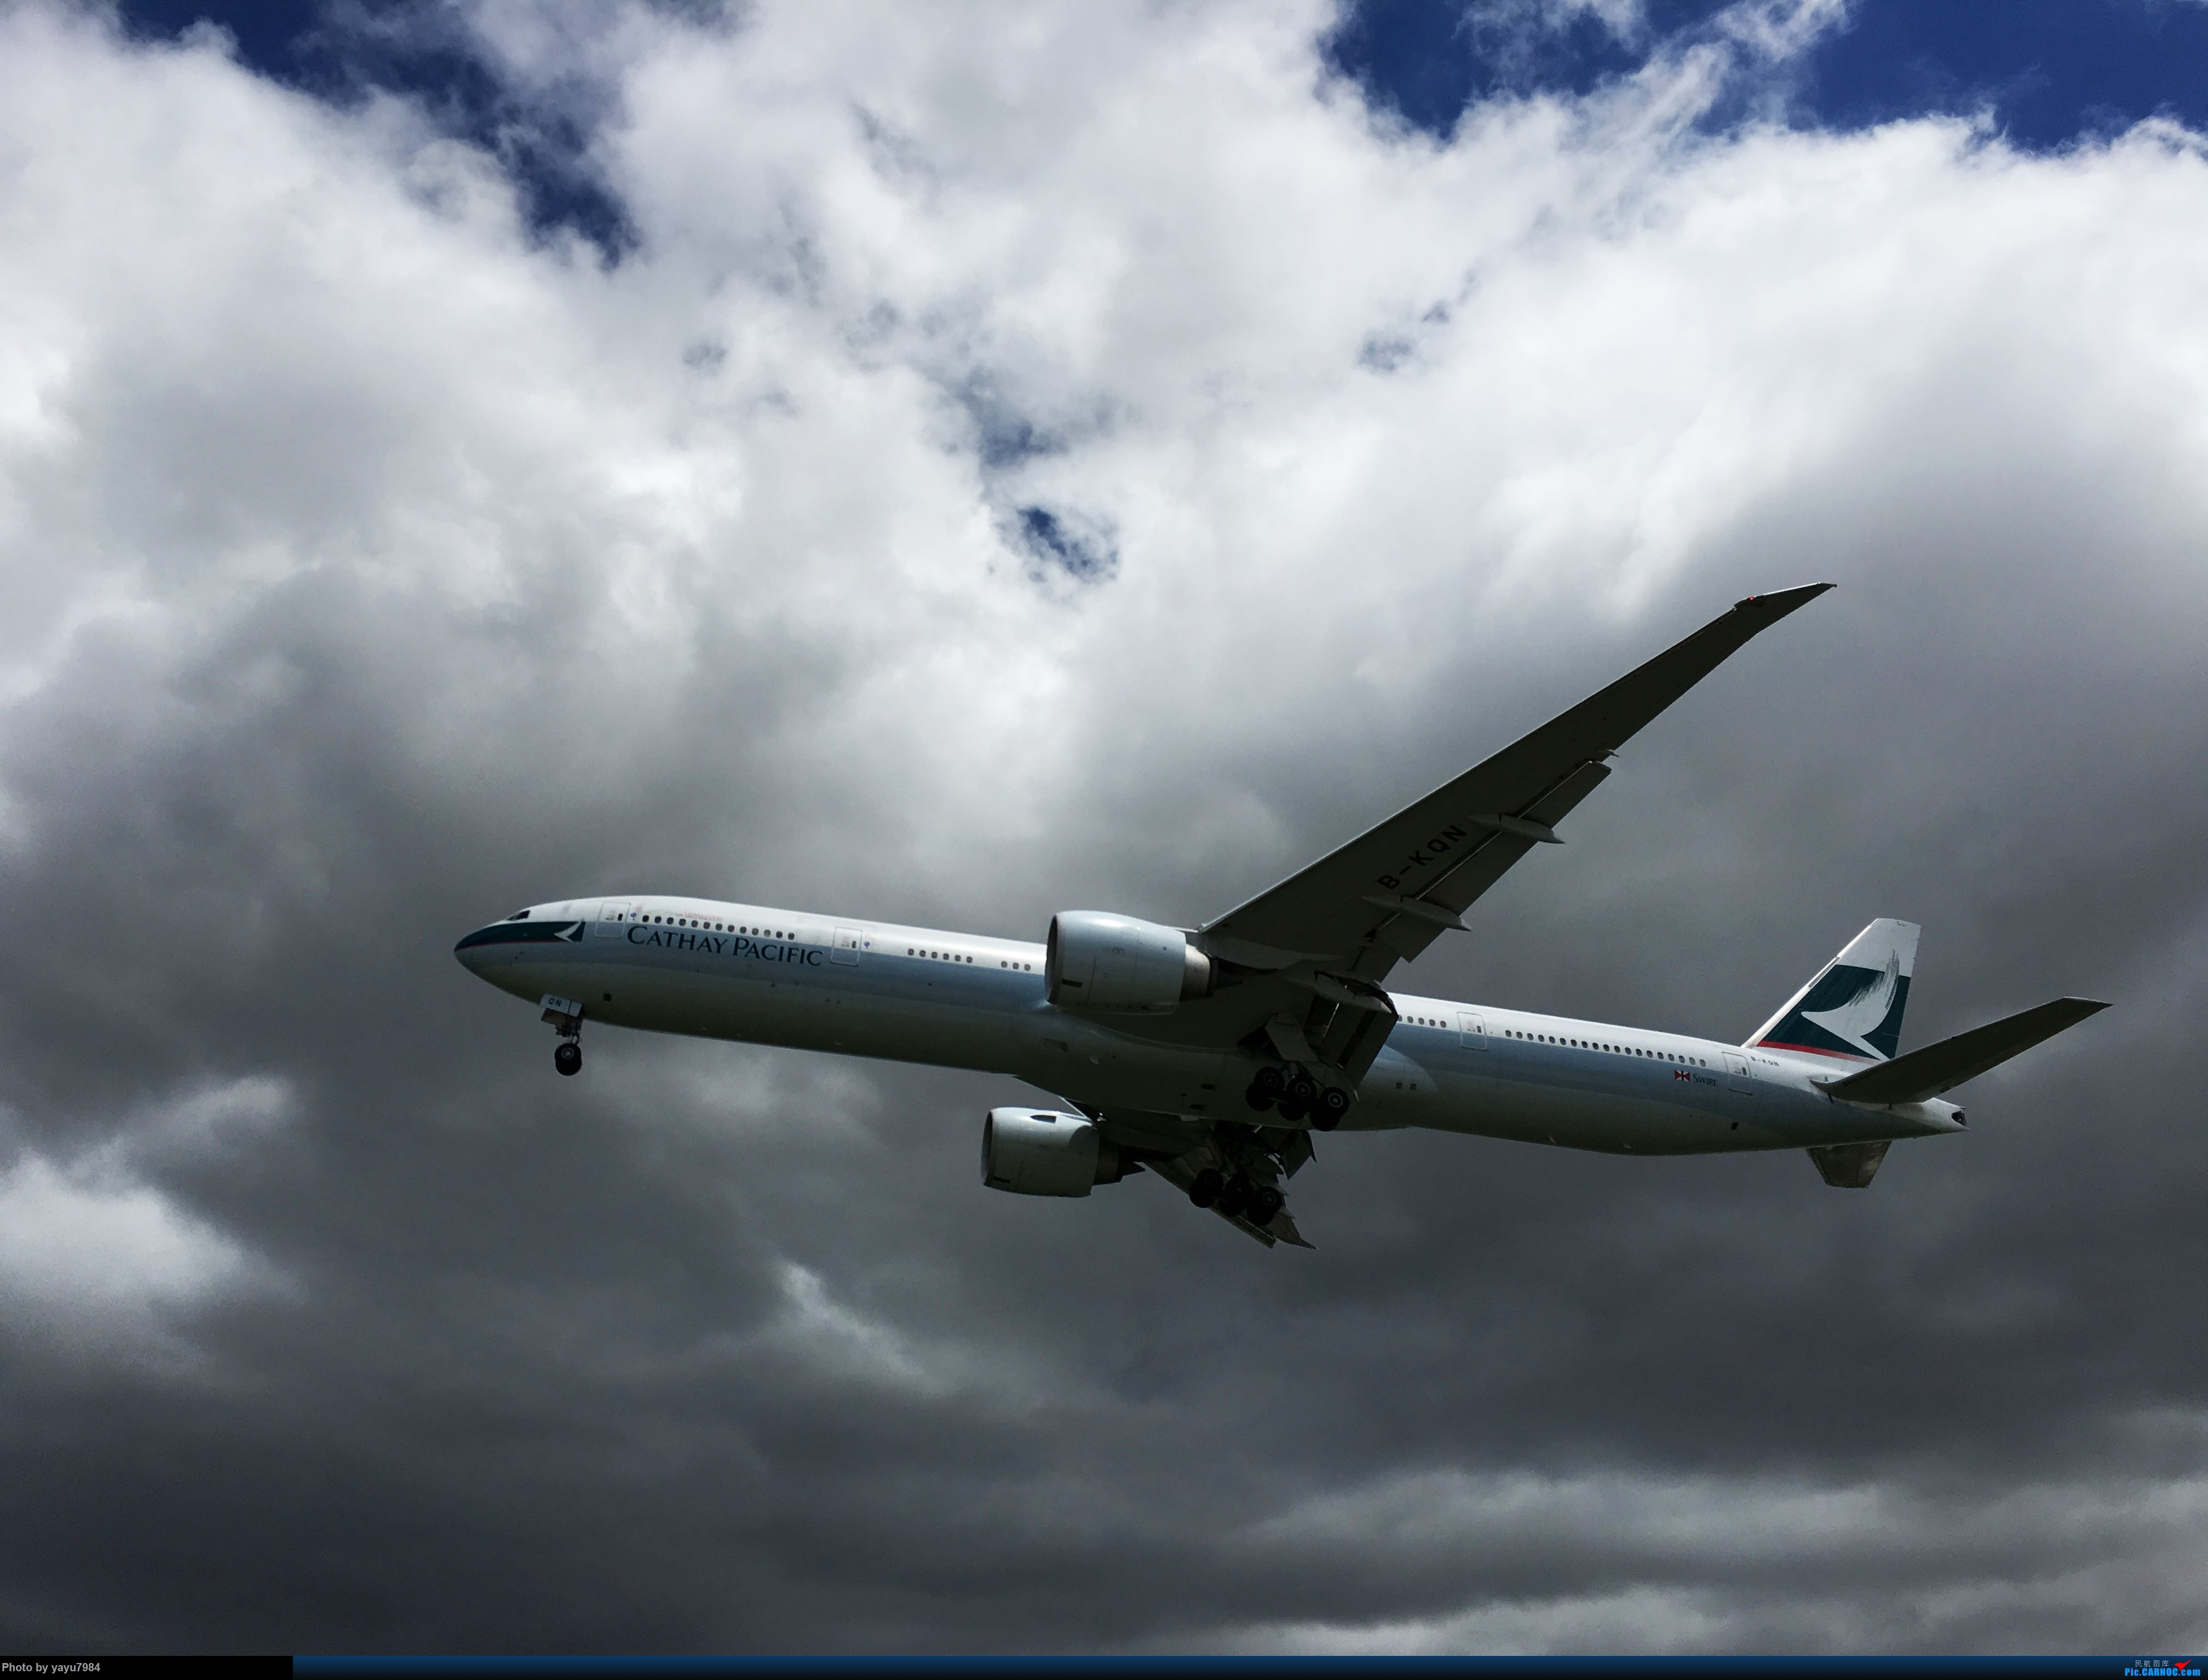 Re:[原创][SYD] 华航A350帝雉号首航悉尼 + 村里的其他常客 BOEING 777-300ER B-KQN 澳大利亚悉尼金斯福德·史密斯机场